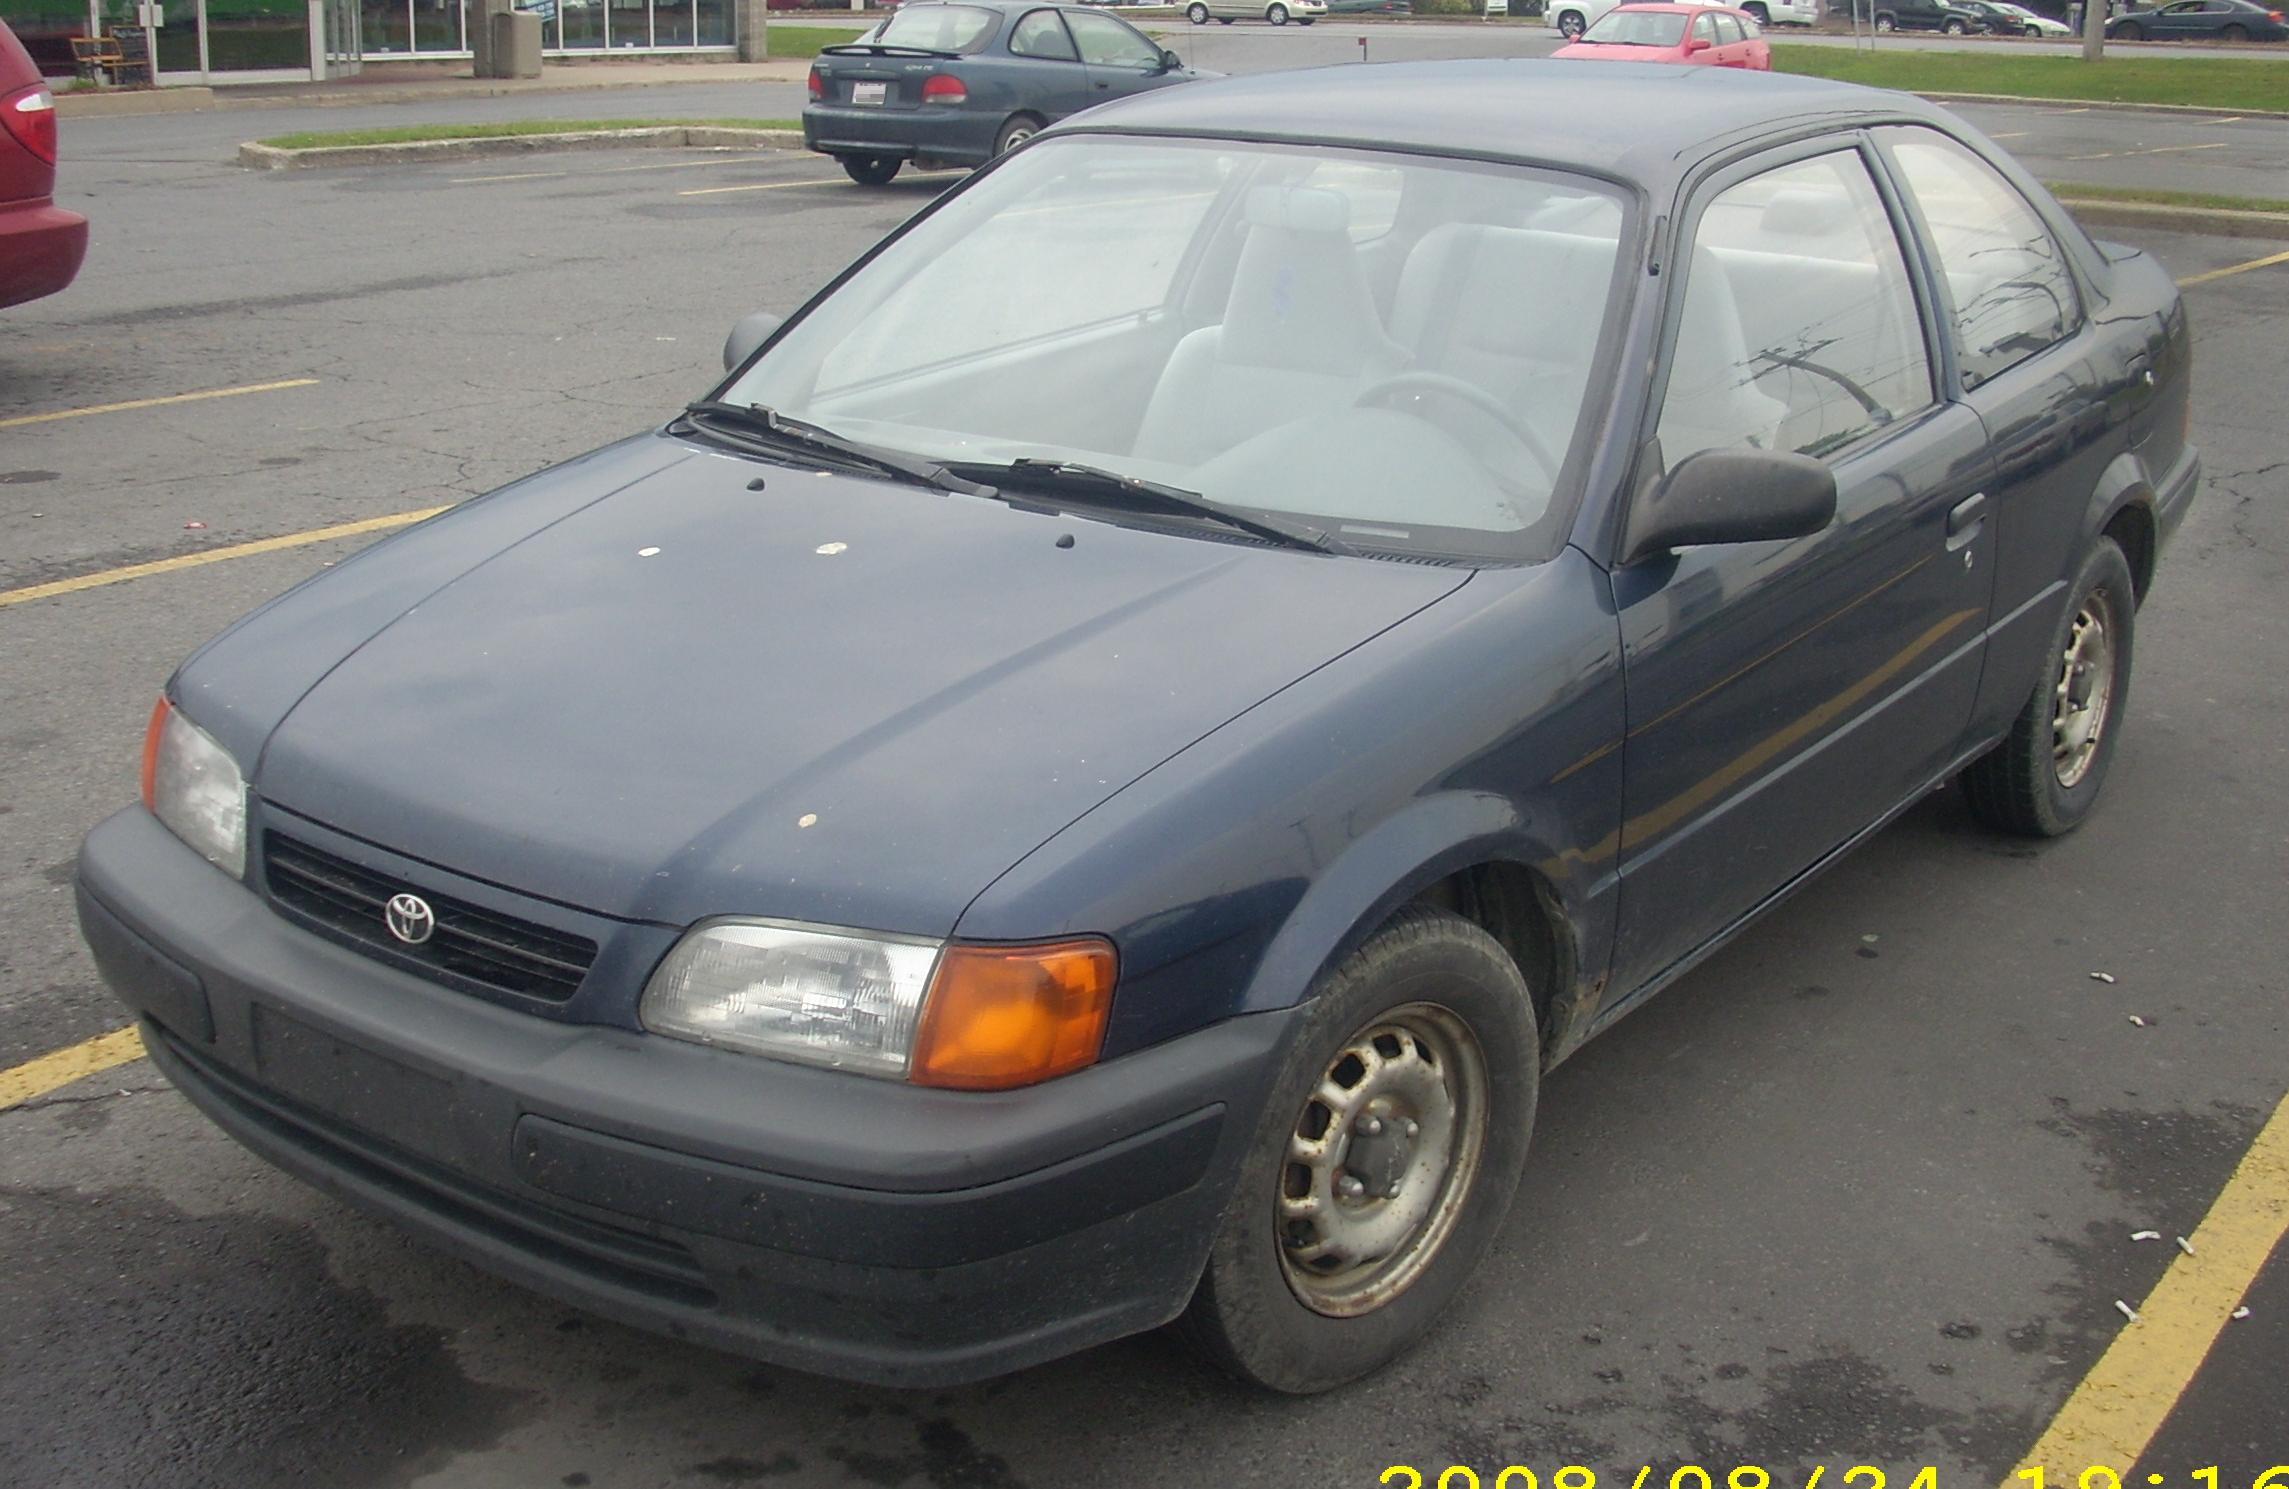 1995 Toyota Tercel Image 12